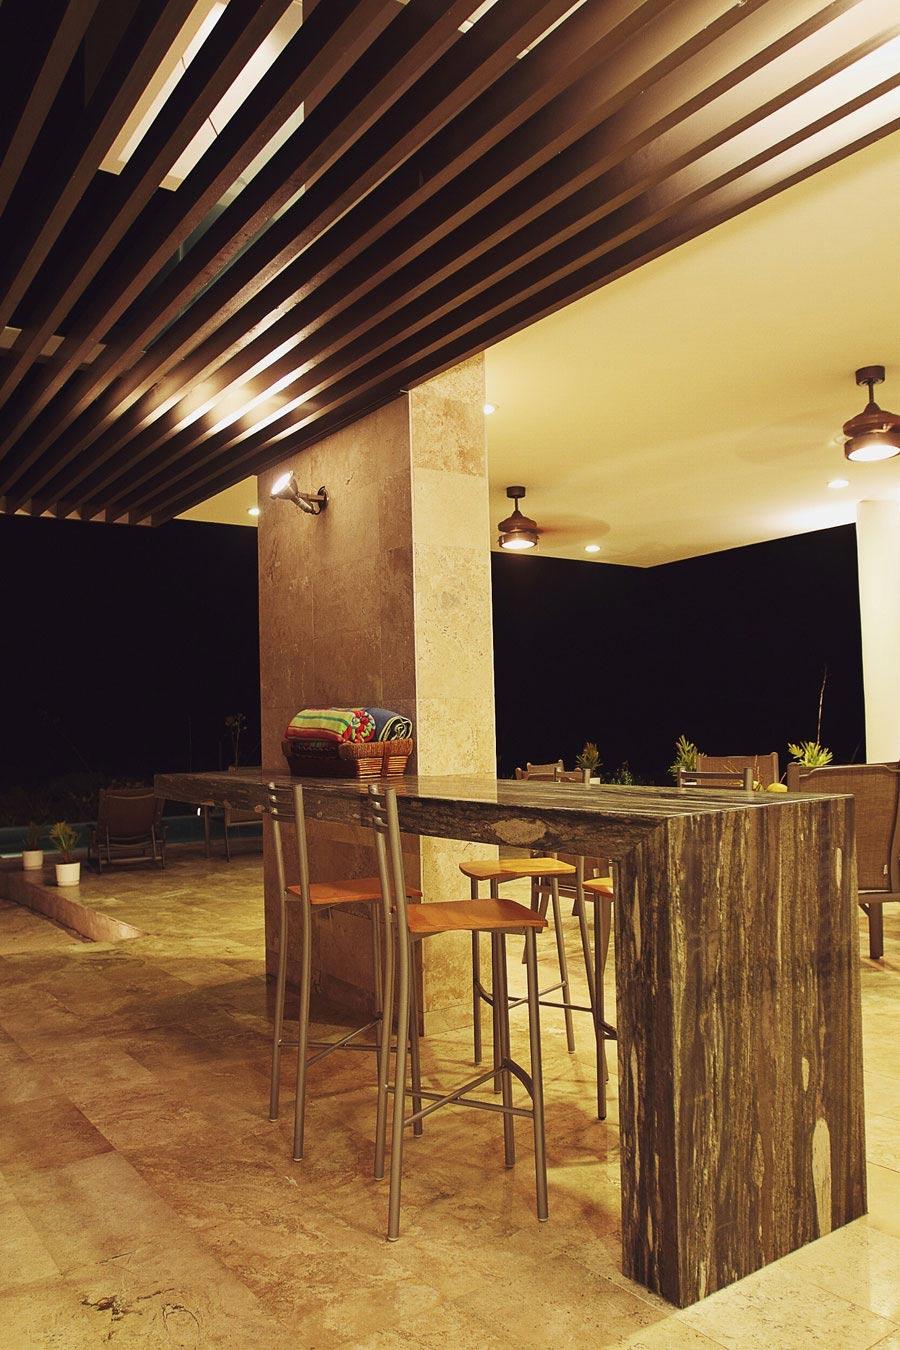 Outdoor Table, Tuunich Kanab in San Bruno, Mexico by Seijo Peon Arquitectos